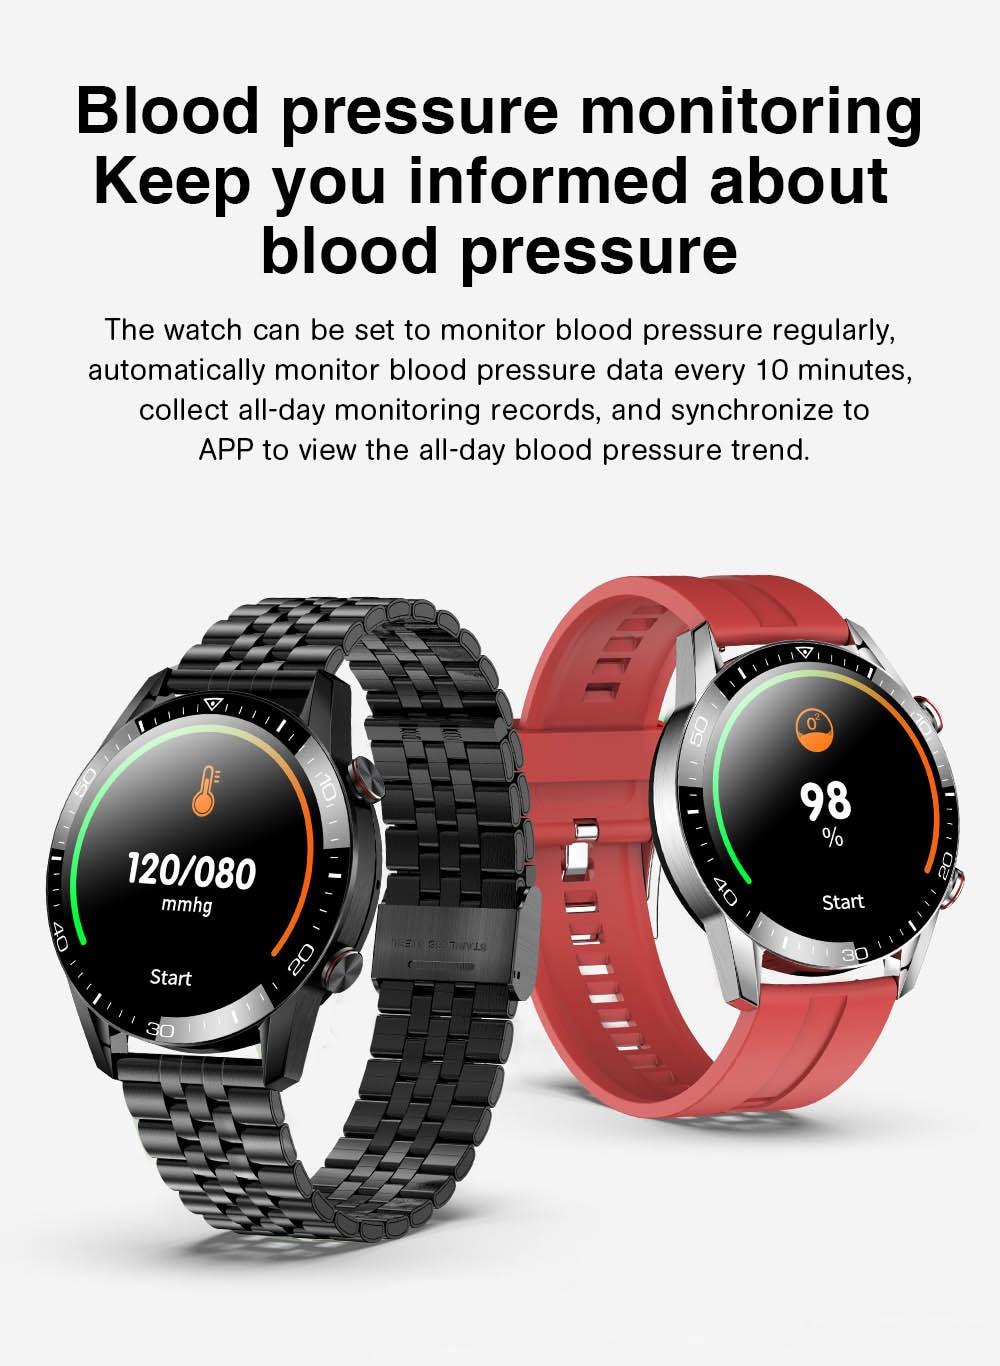 Hef29591620b64fecbf133a3e87920baeQ TK2-8 Smart Watch For Men Bluetooth Call IP68 Waterproof Blood Pressure Heart Rate Monitor New SmartWatch Sports Fitness Tracker